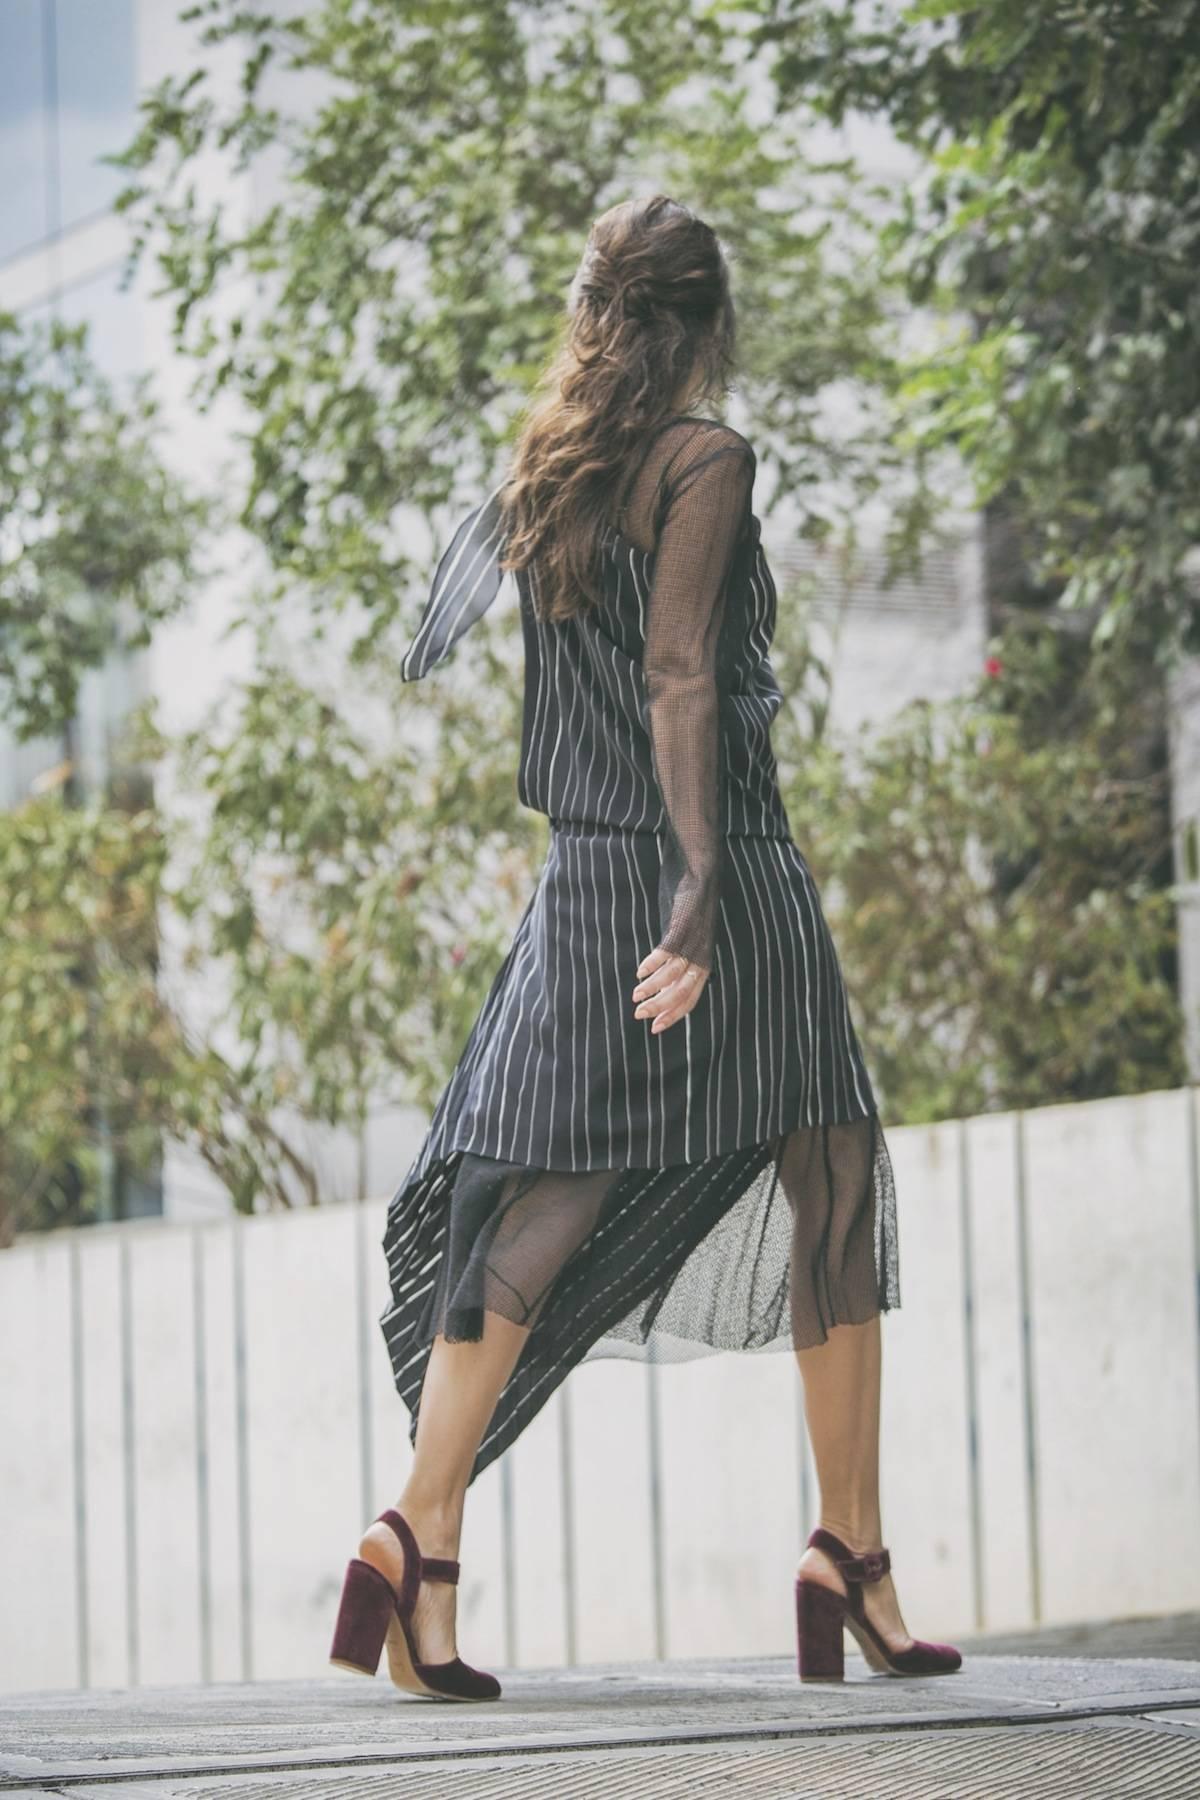 ysmf.deuxhommes.striped.asymetric.dress